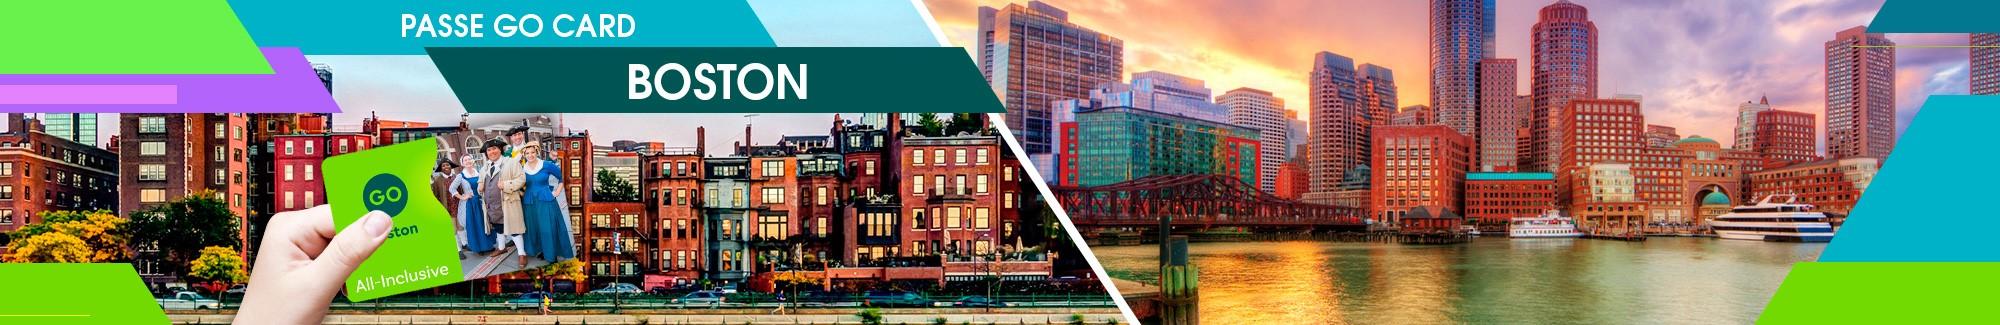 Go Card Boston